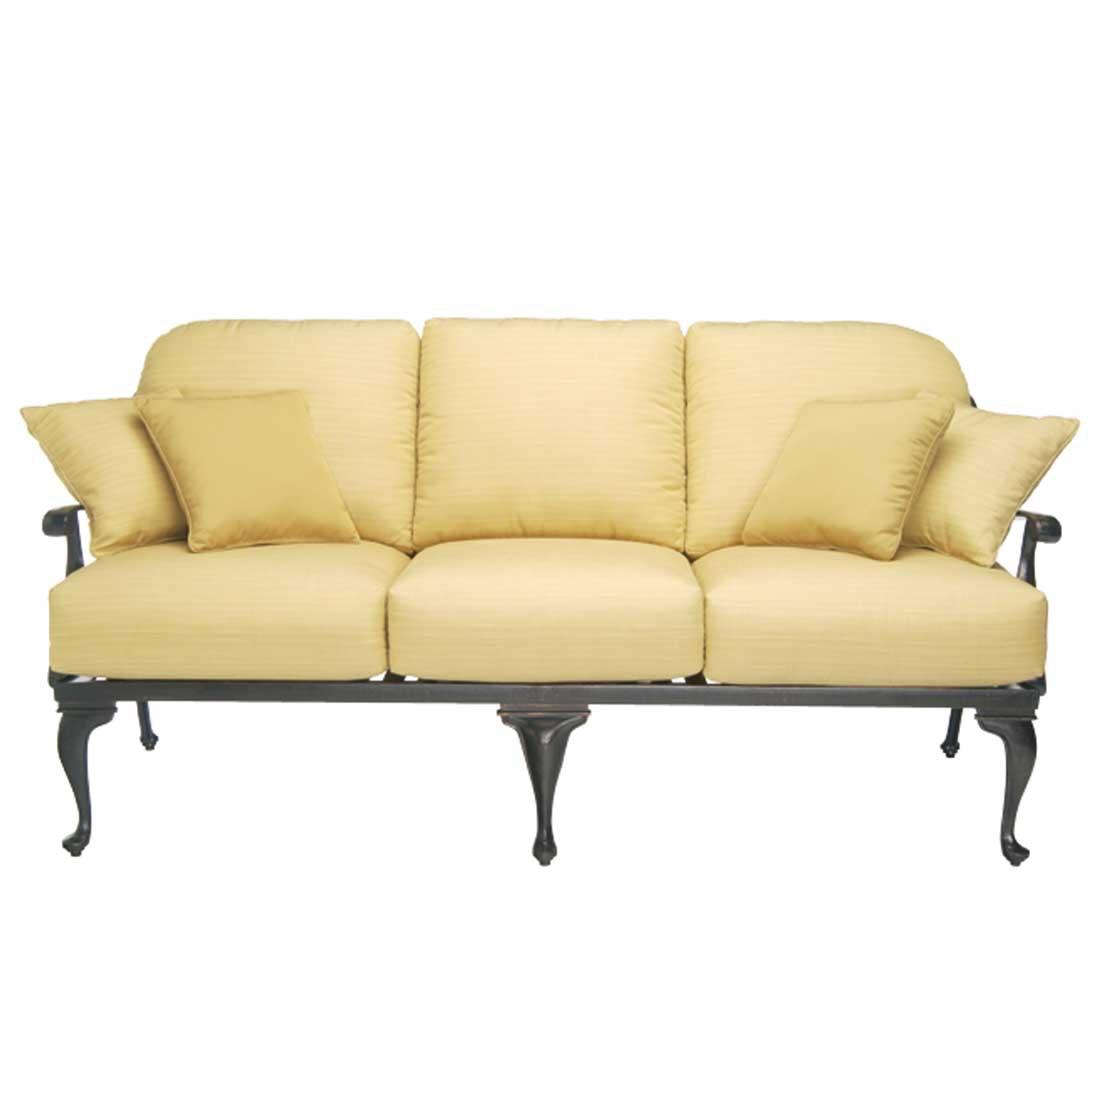 Summer Classics Provance Sofa 40642